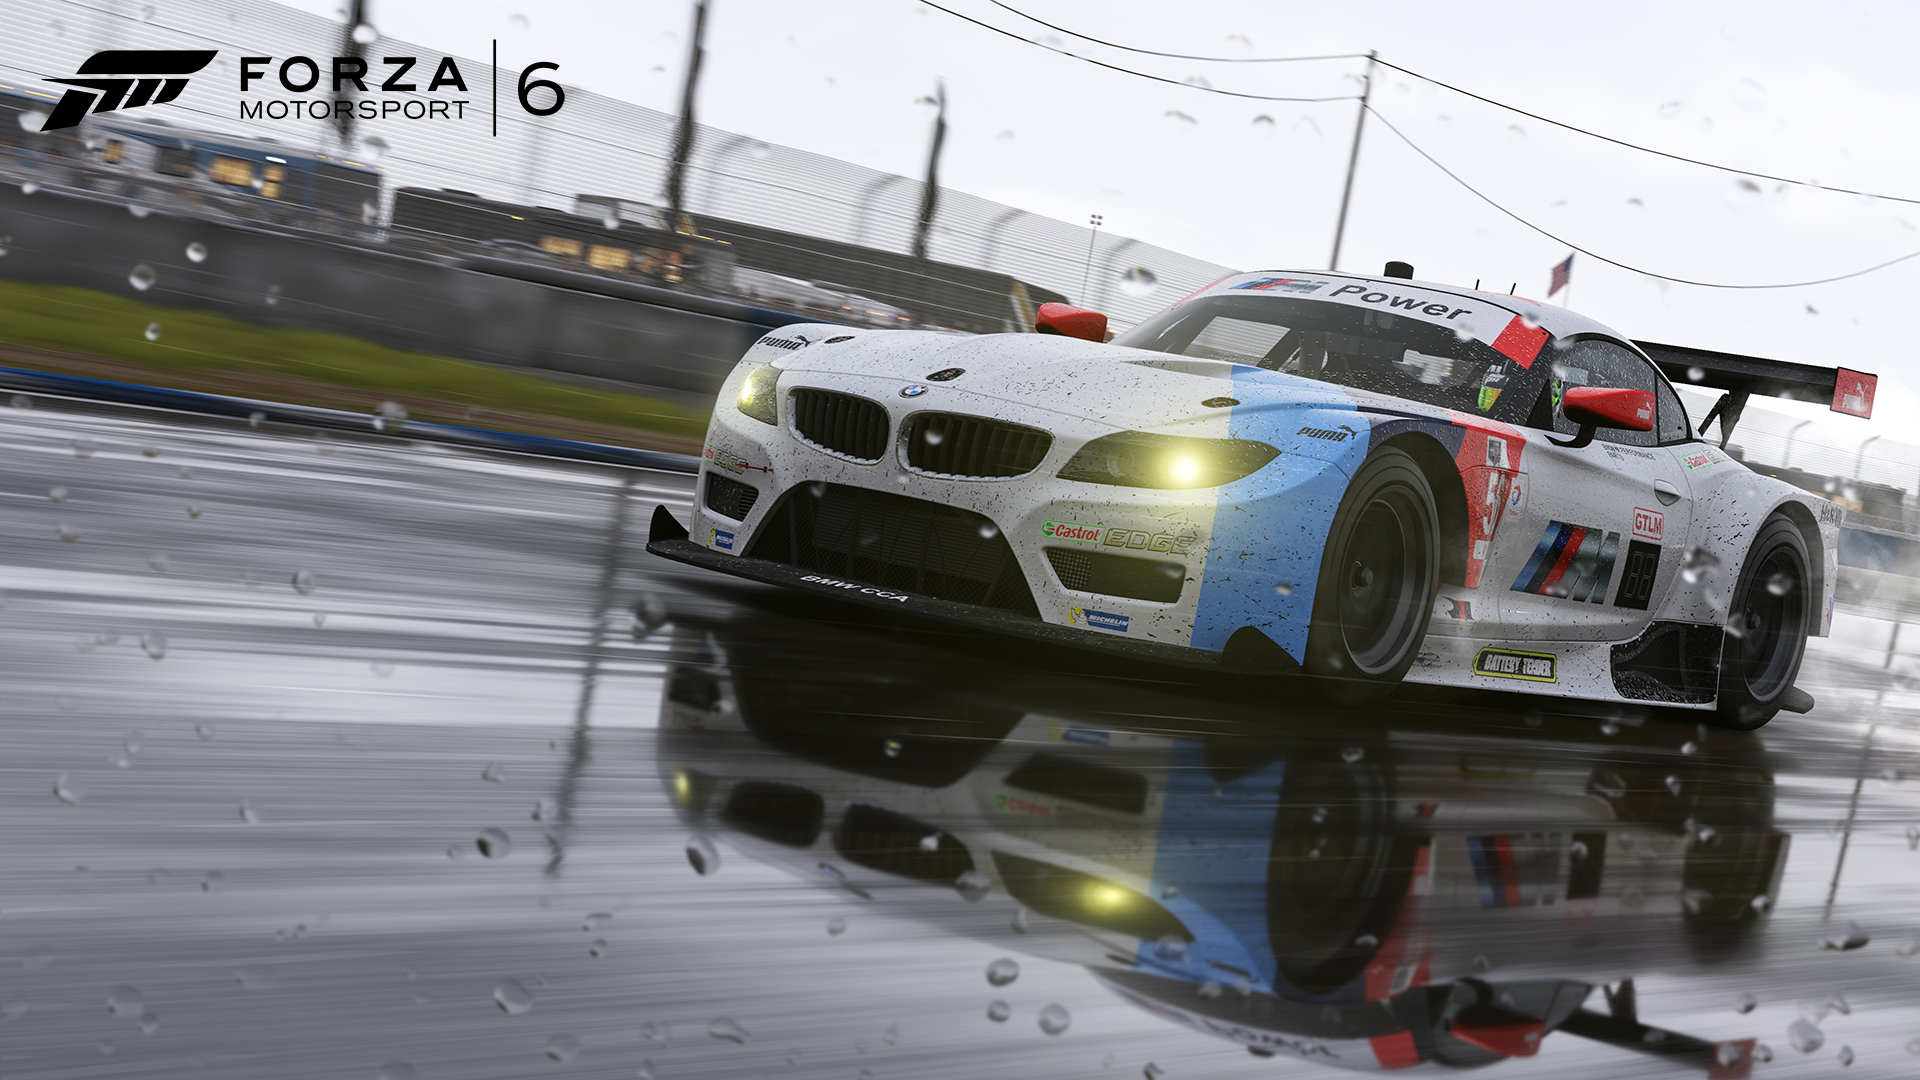 Video Game   Forza Motorsport 6 Wallpaper 1920x1080